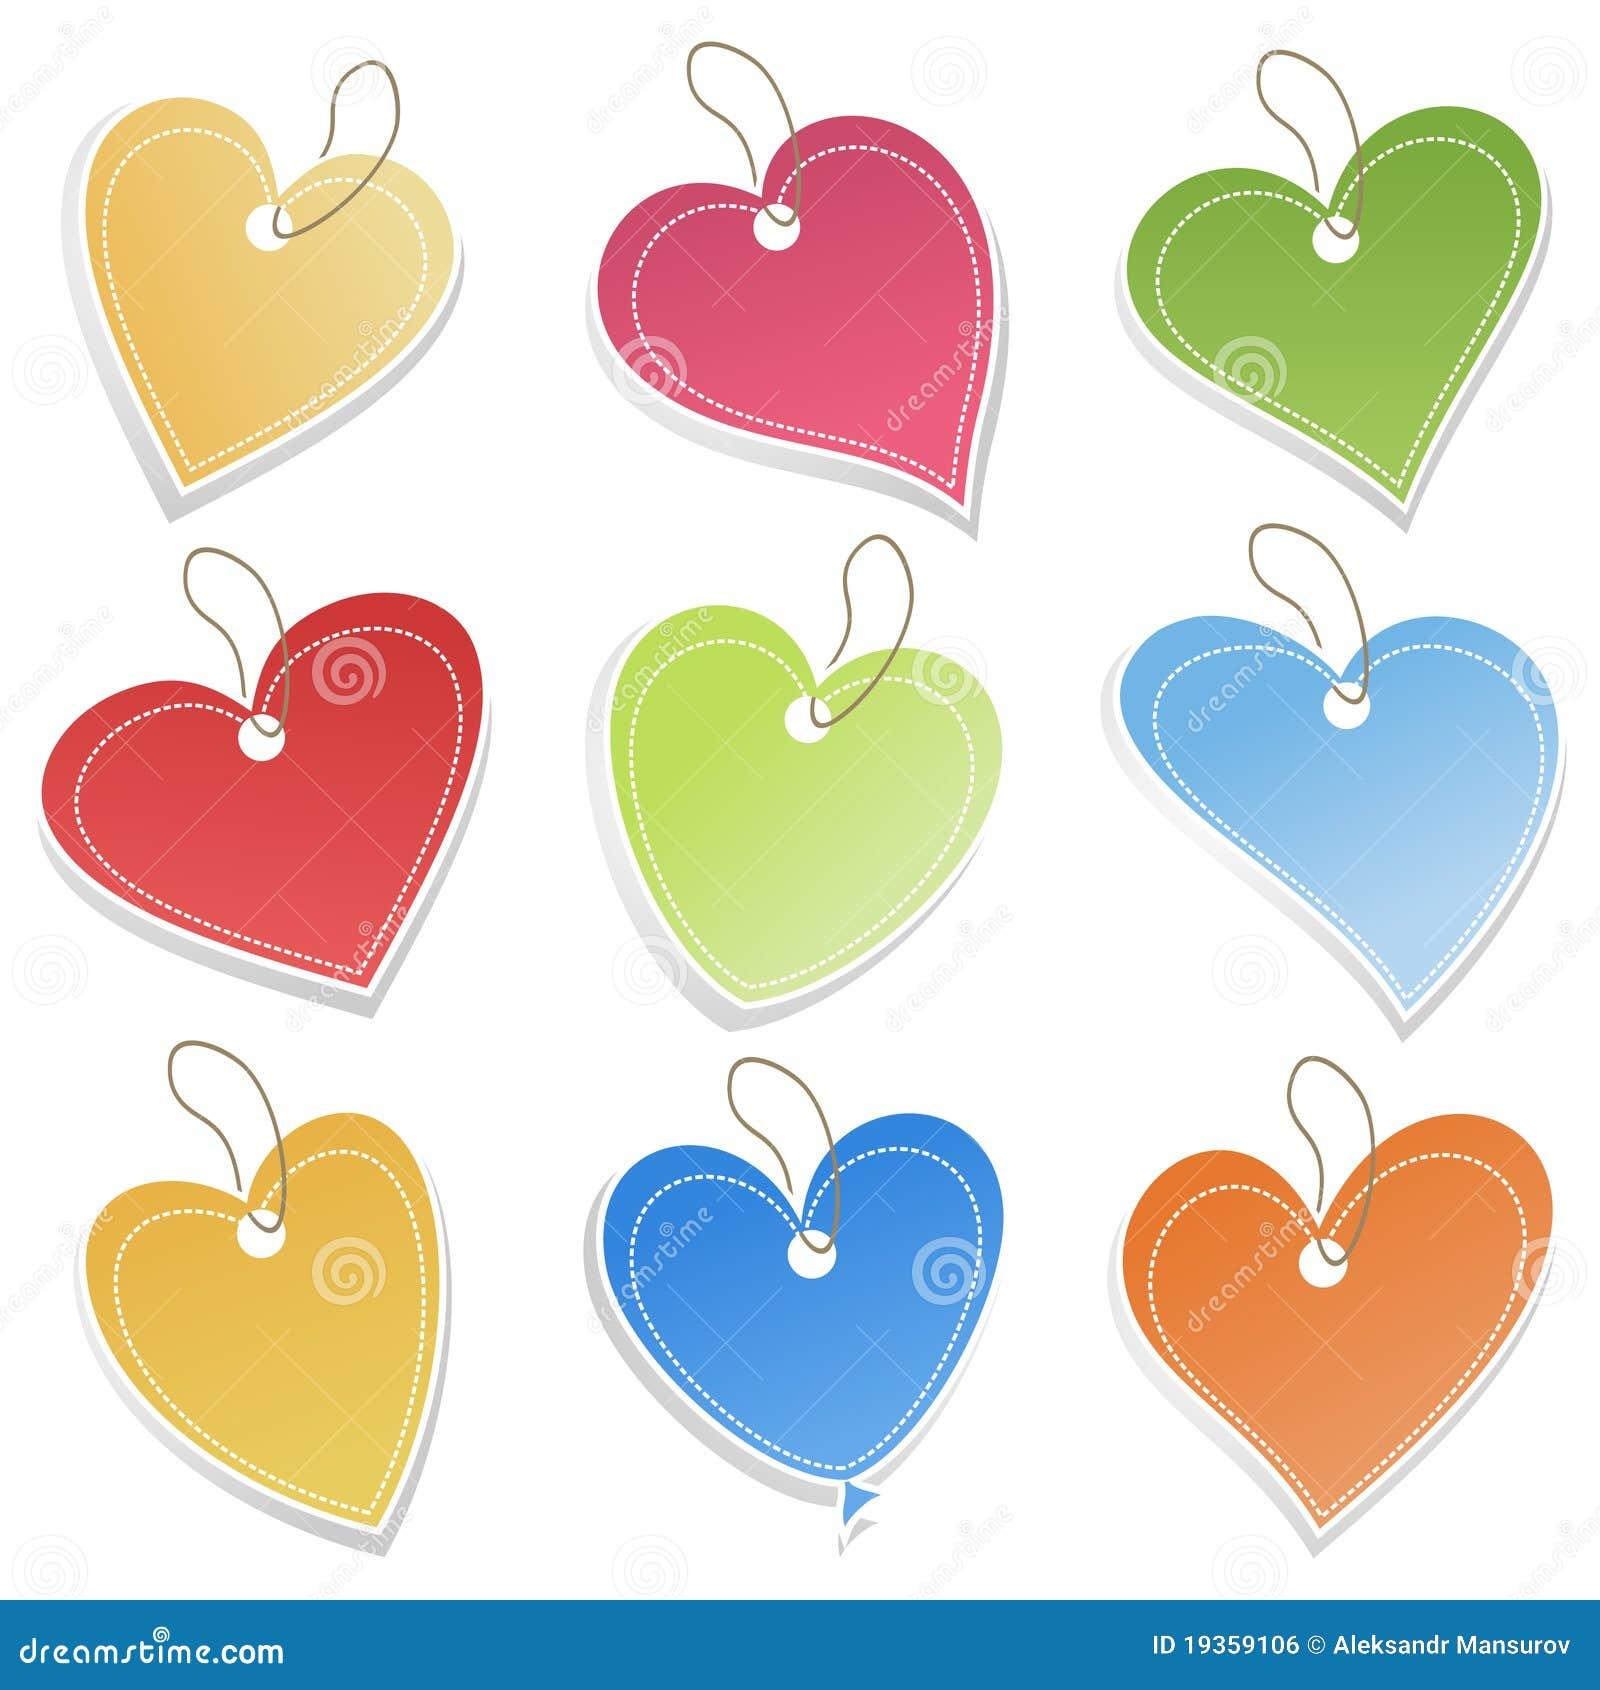 Amor icon3